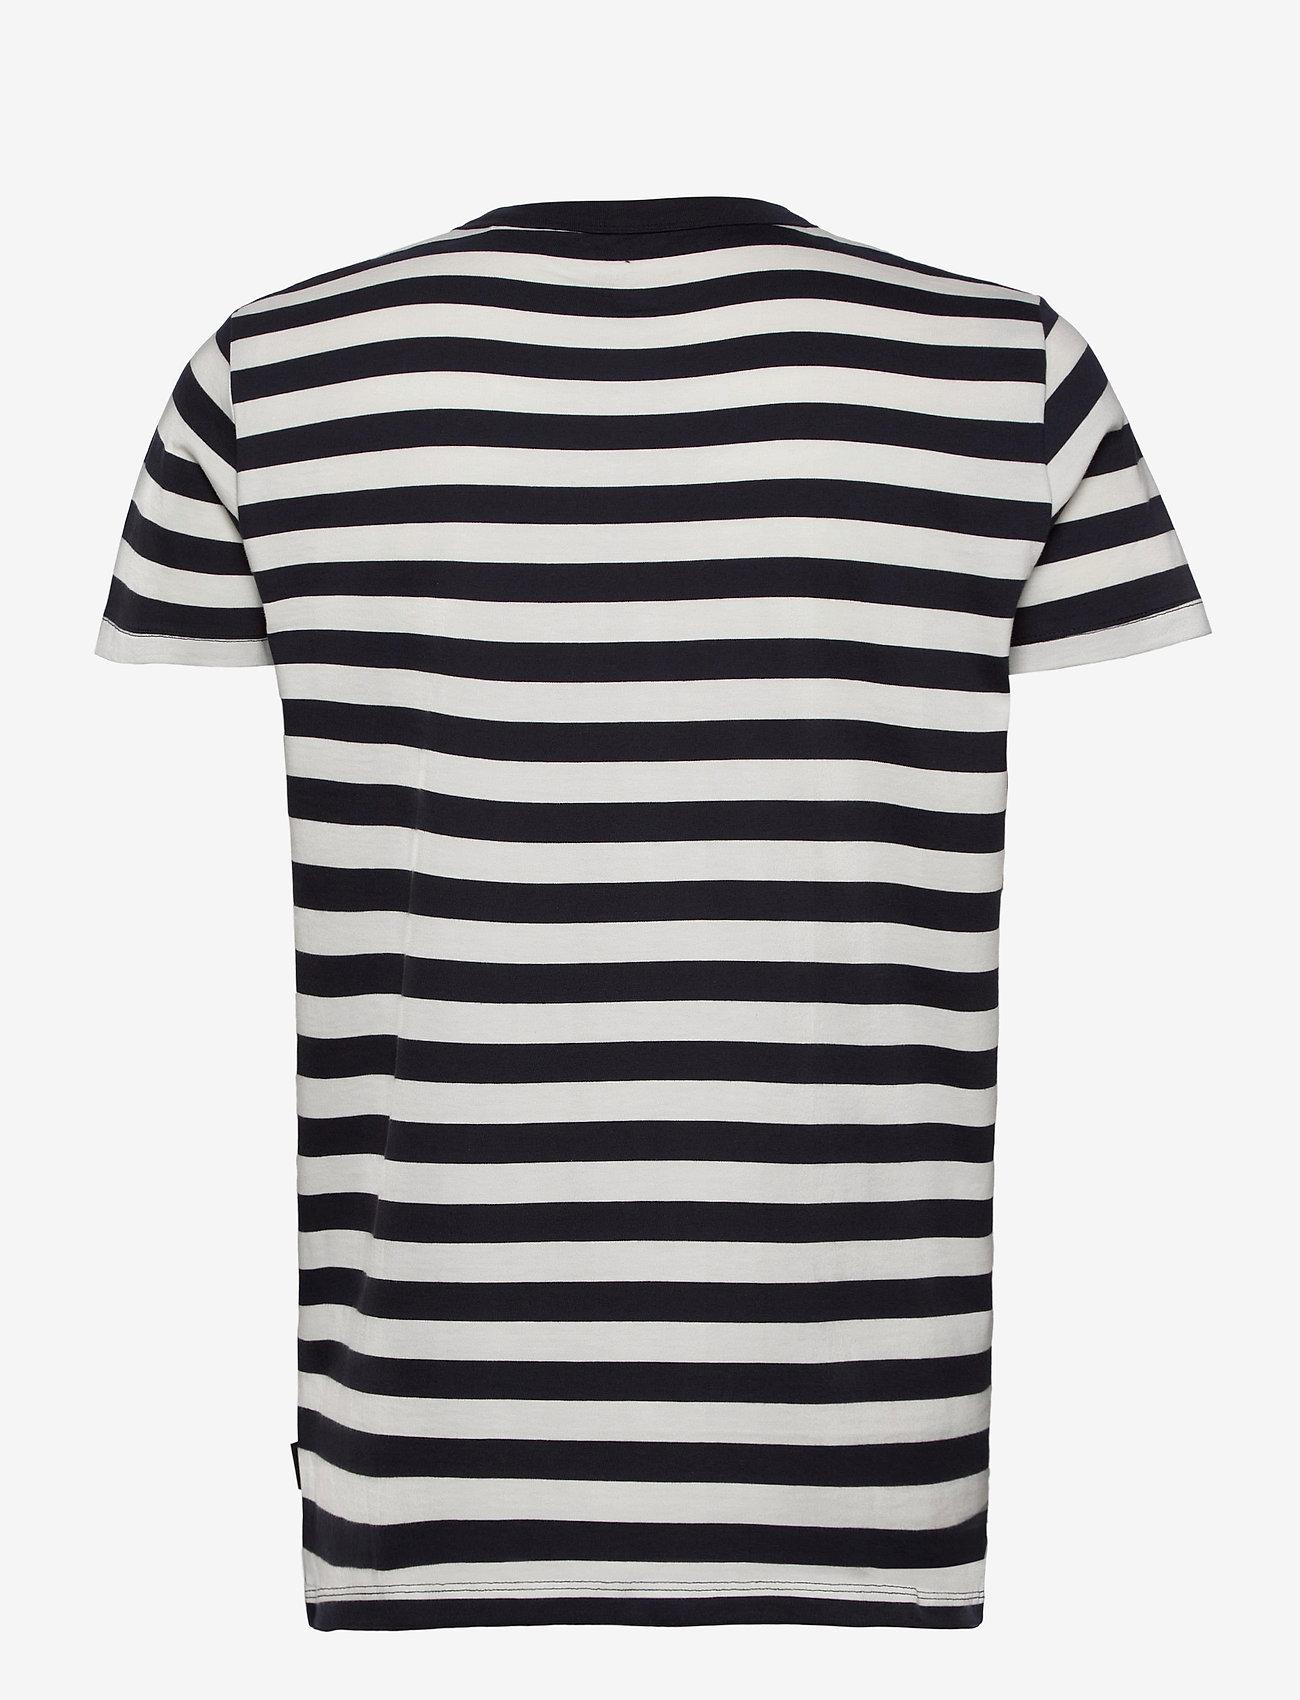 Esprit Casual - T-Shirts - short-sleeved t-shirts - navy 3 - 1